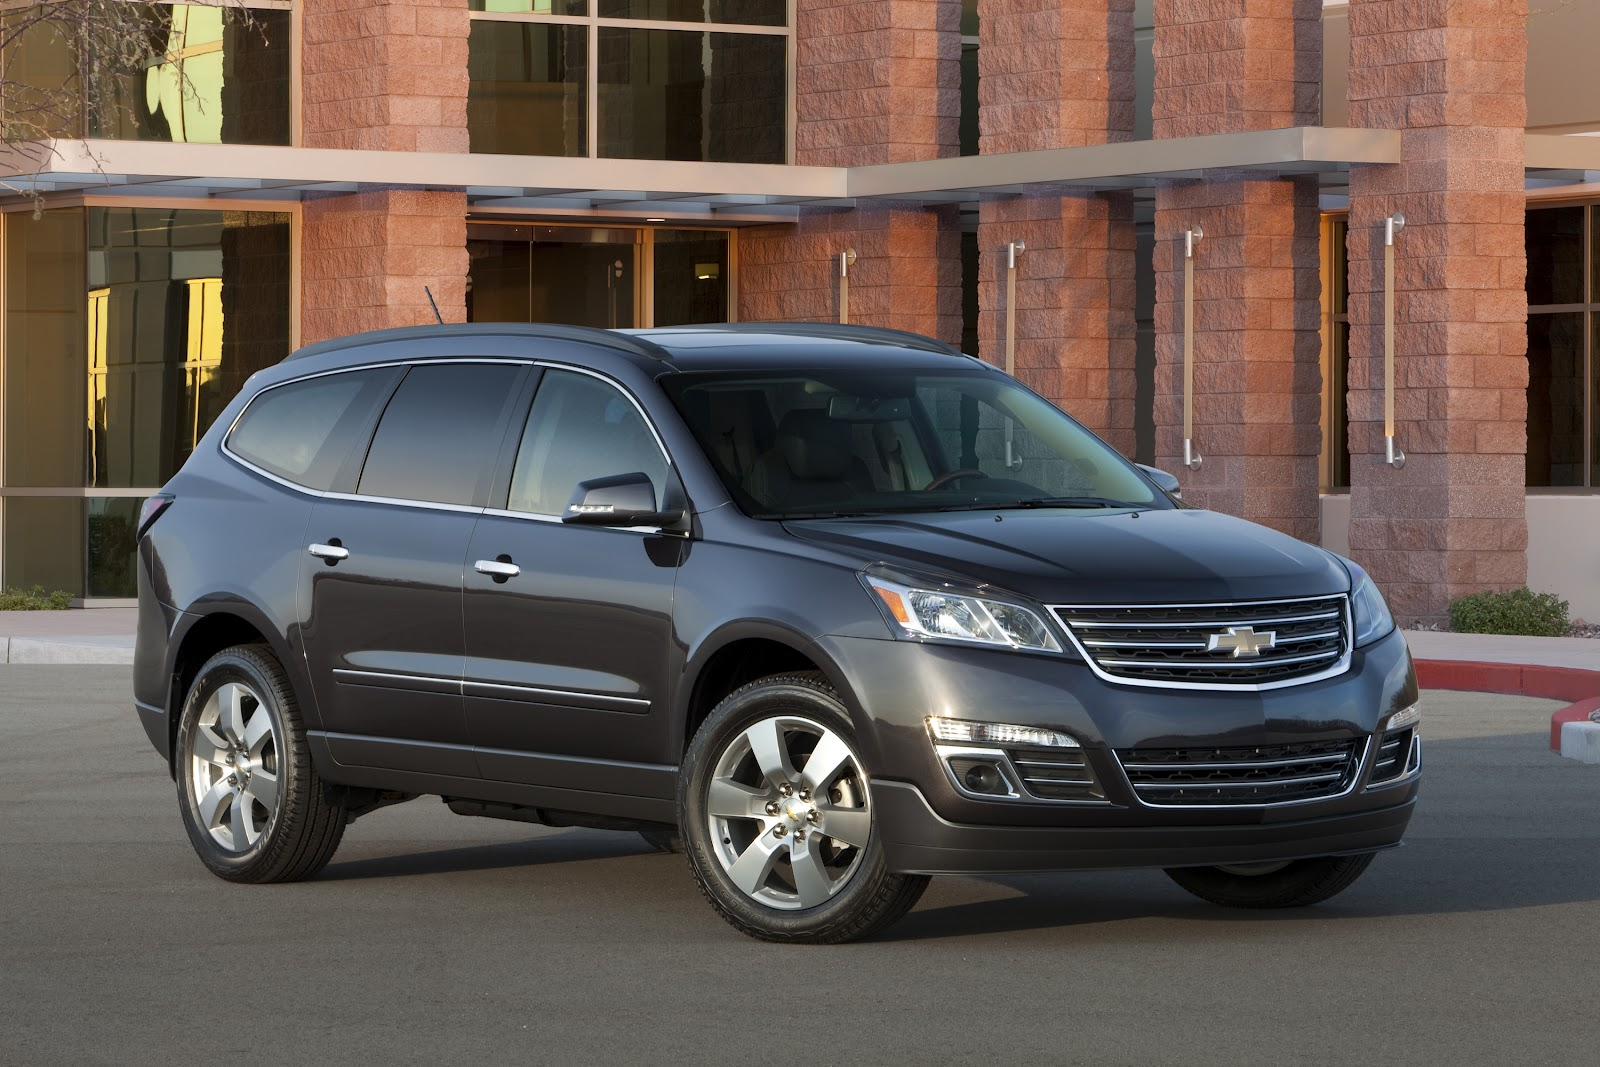 chevrolet - 2009 - [Chevrolet] traverse 2013+chevrolet+traverse+5